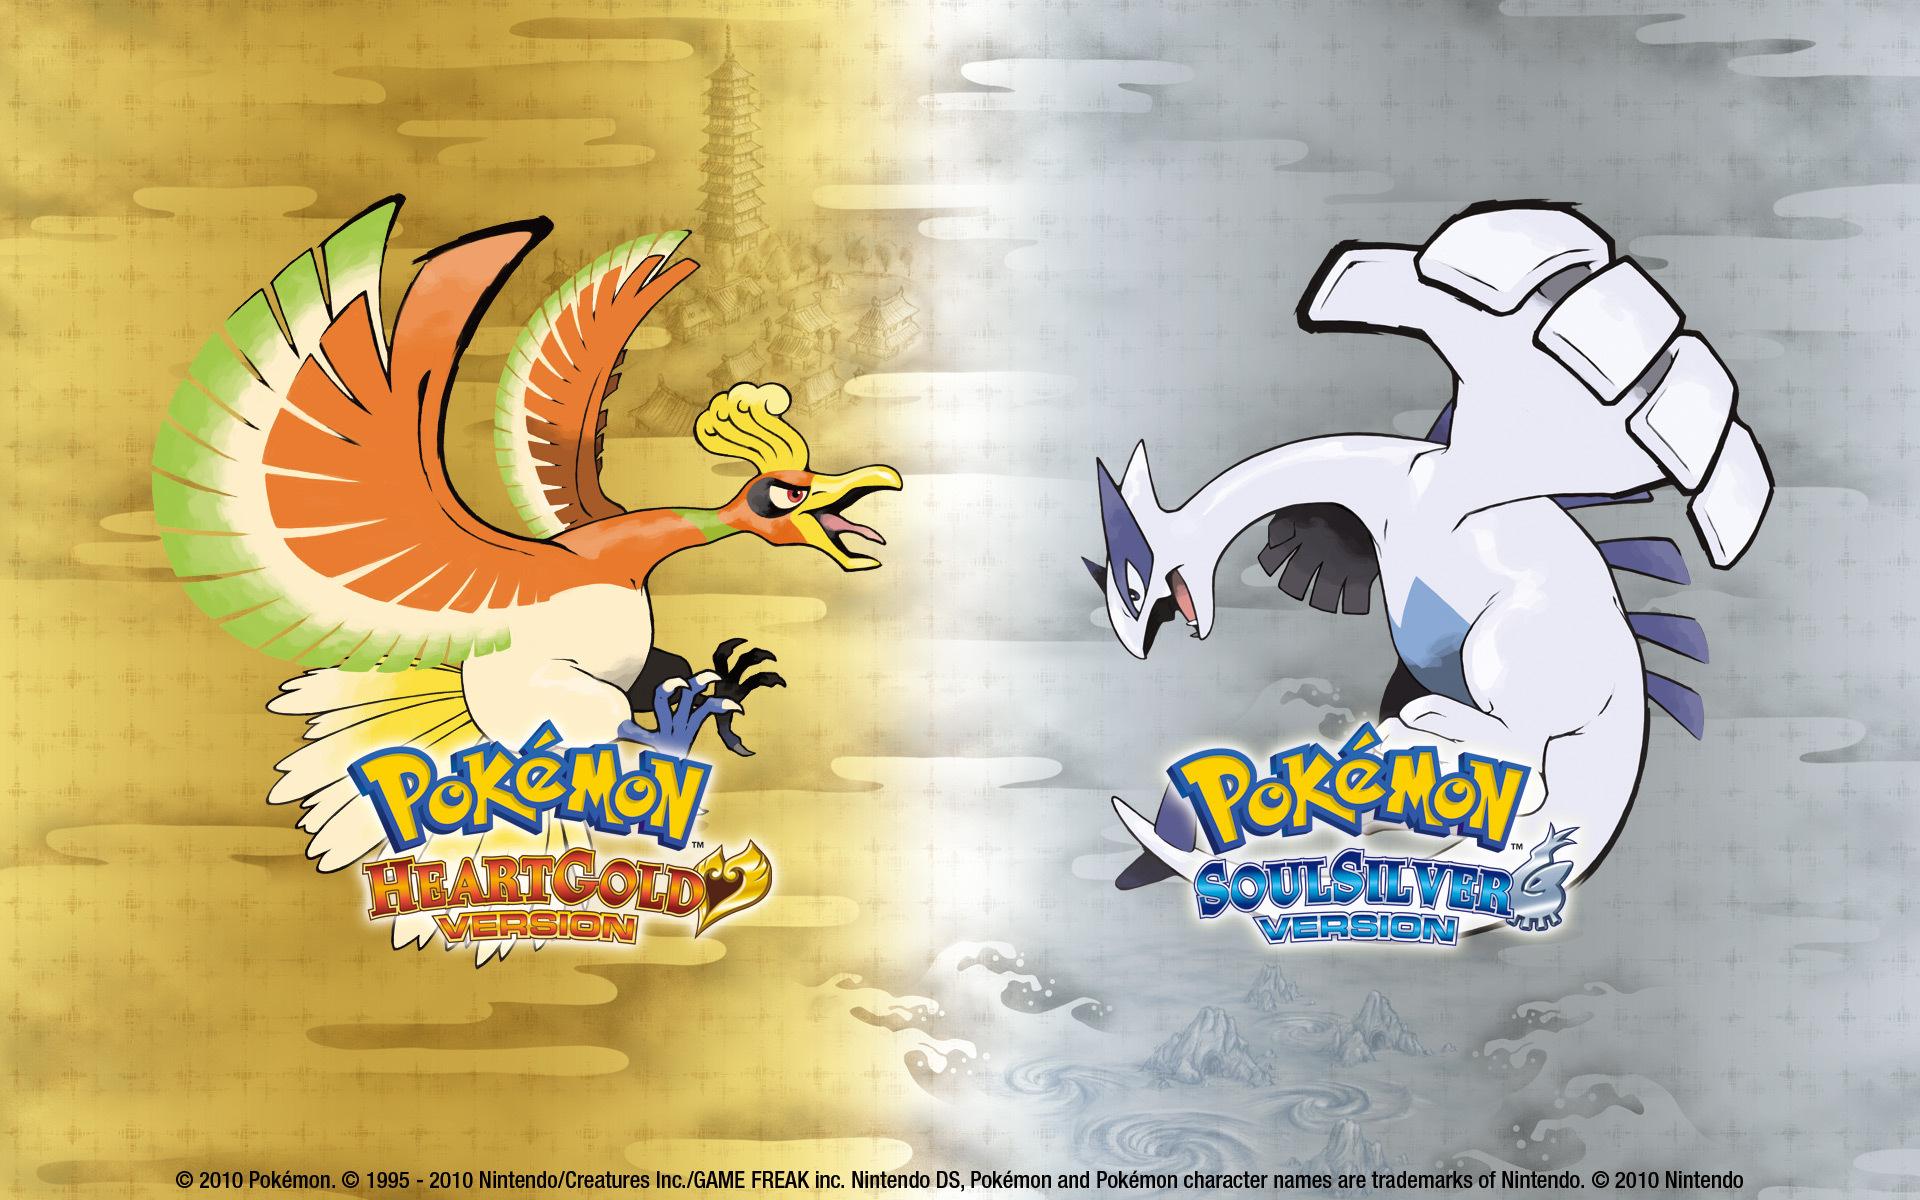 PR: Pokémon HeartGold & Pokémon SoulSilver: Super Music Collection launches on iTunes today